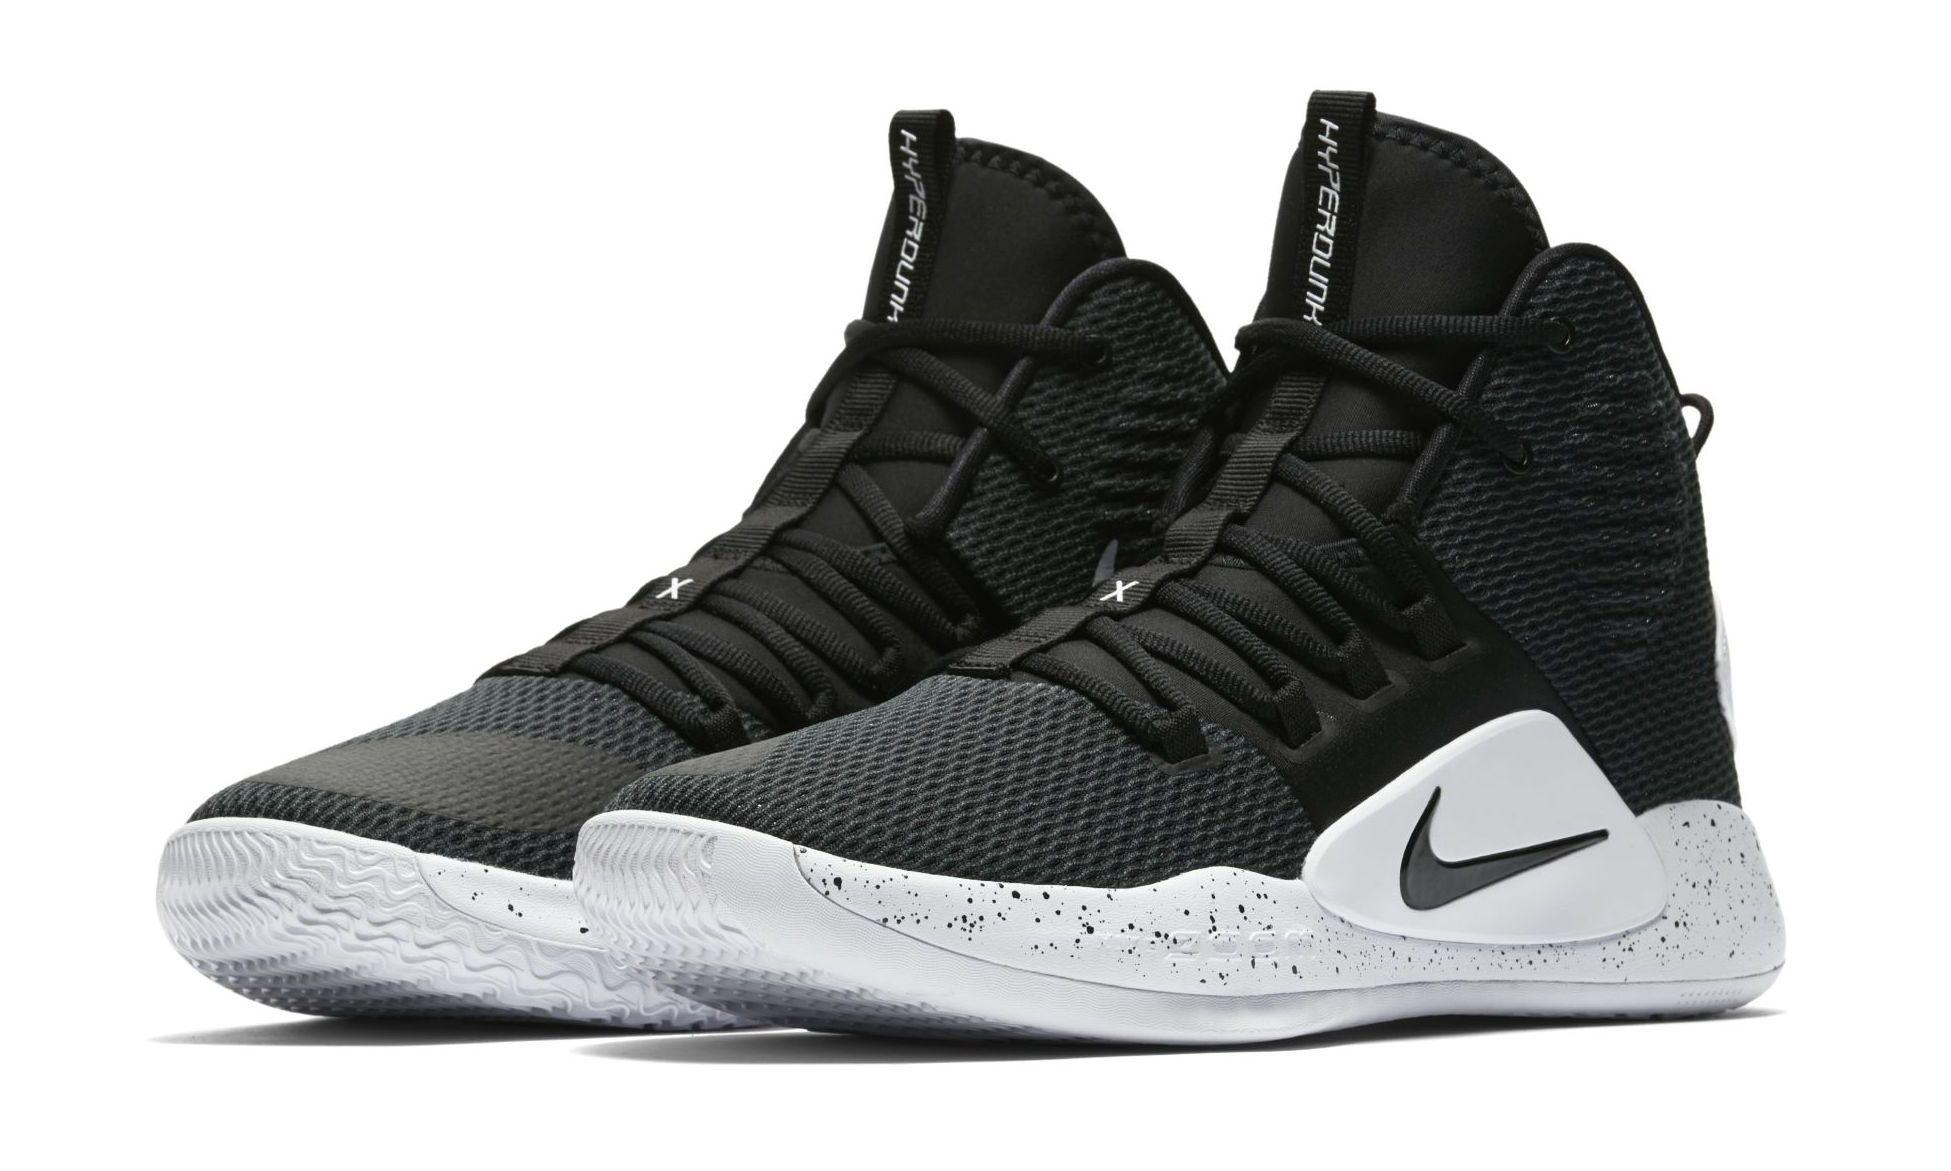 NIKE Men's Hyperdunk X Basketball Shoe